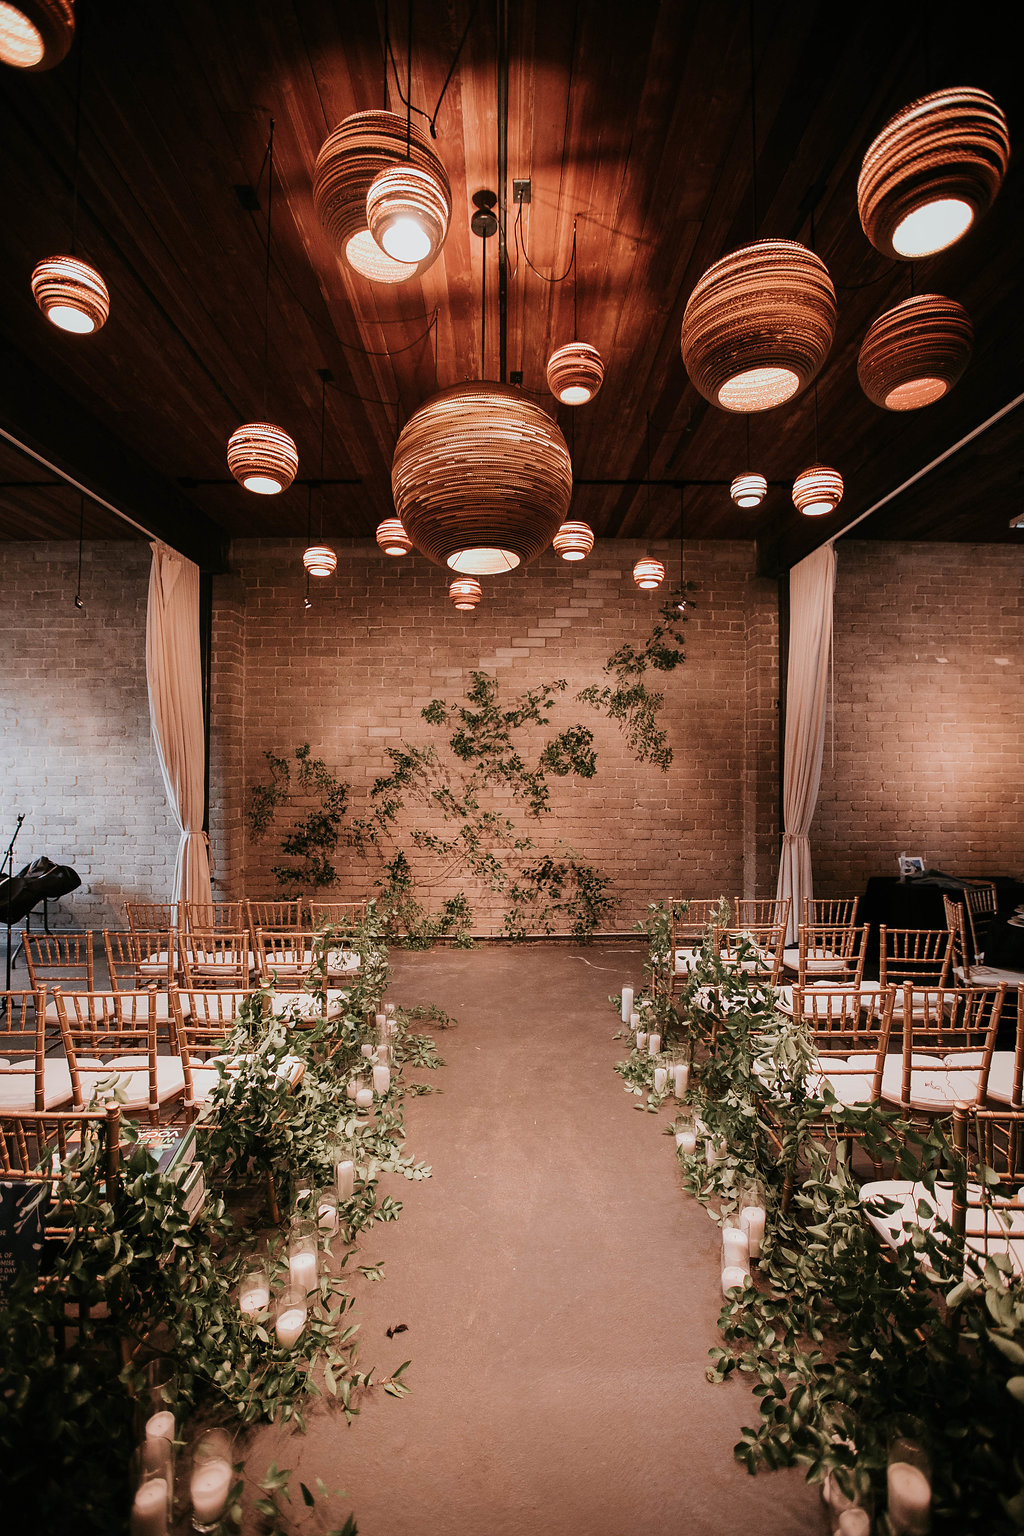 The_Big_Fake_wedding_Seattle_Within_sodo_wedding_by_Adina_Preston_Weddings_267.JPG